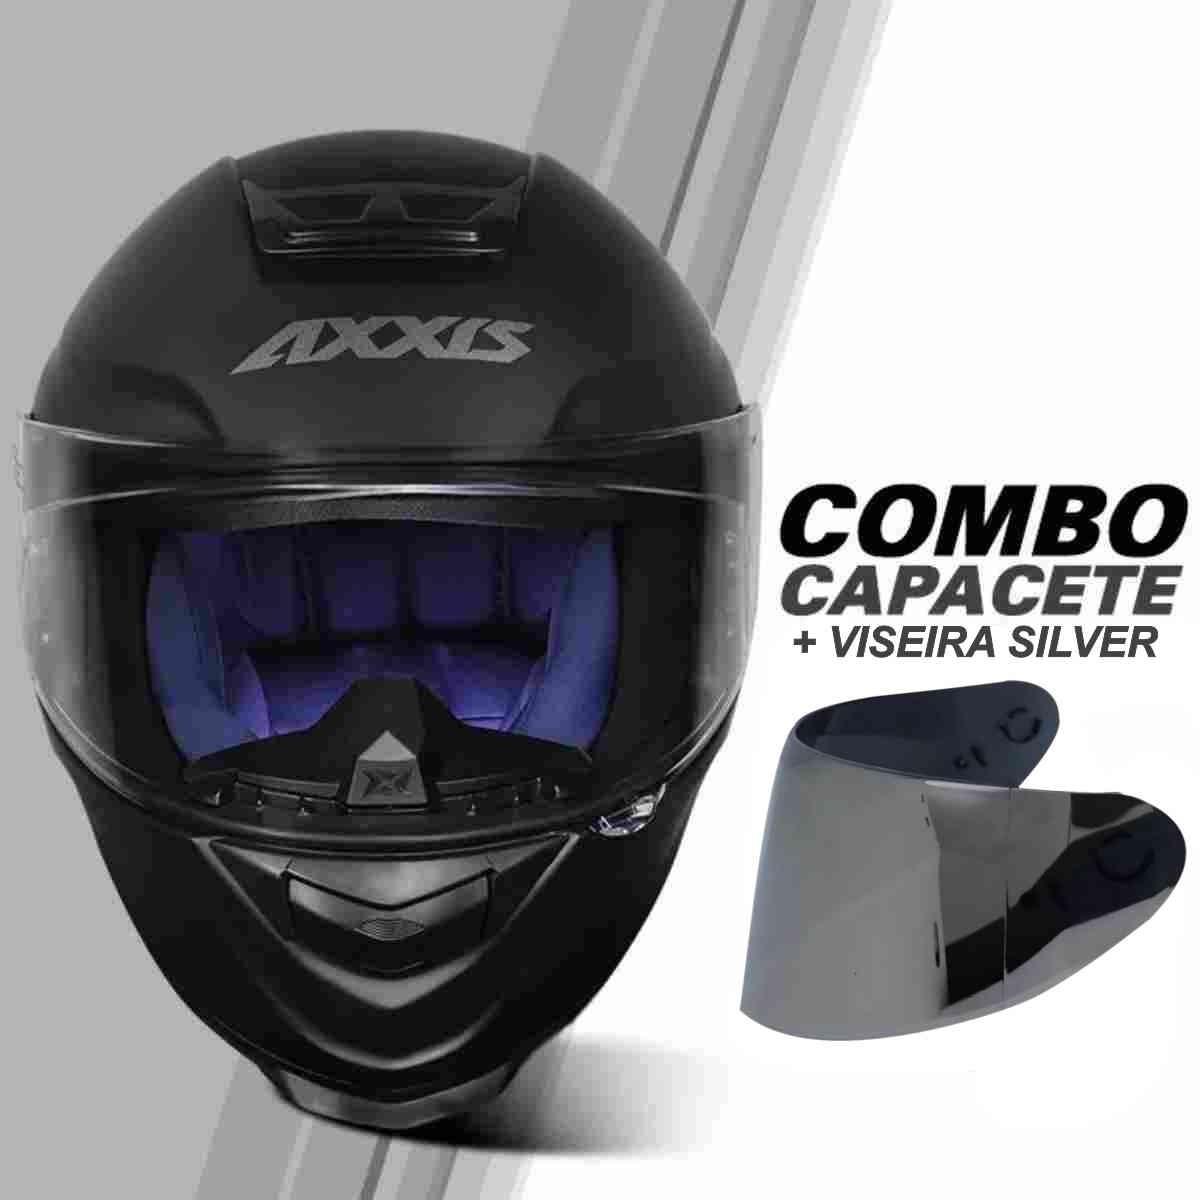 COMBO CAPACETE AXXIS EAGLE SOLID/MONOCOLOR PRETO FOSCO/CINZA + VISEIRA SILVER EXTRA